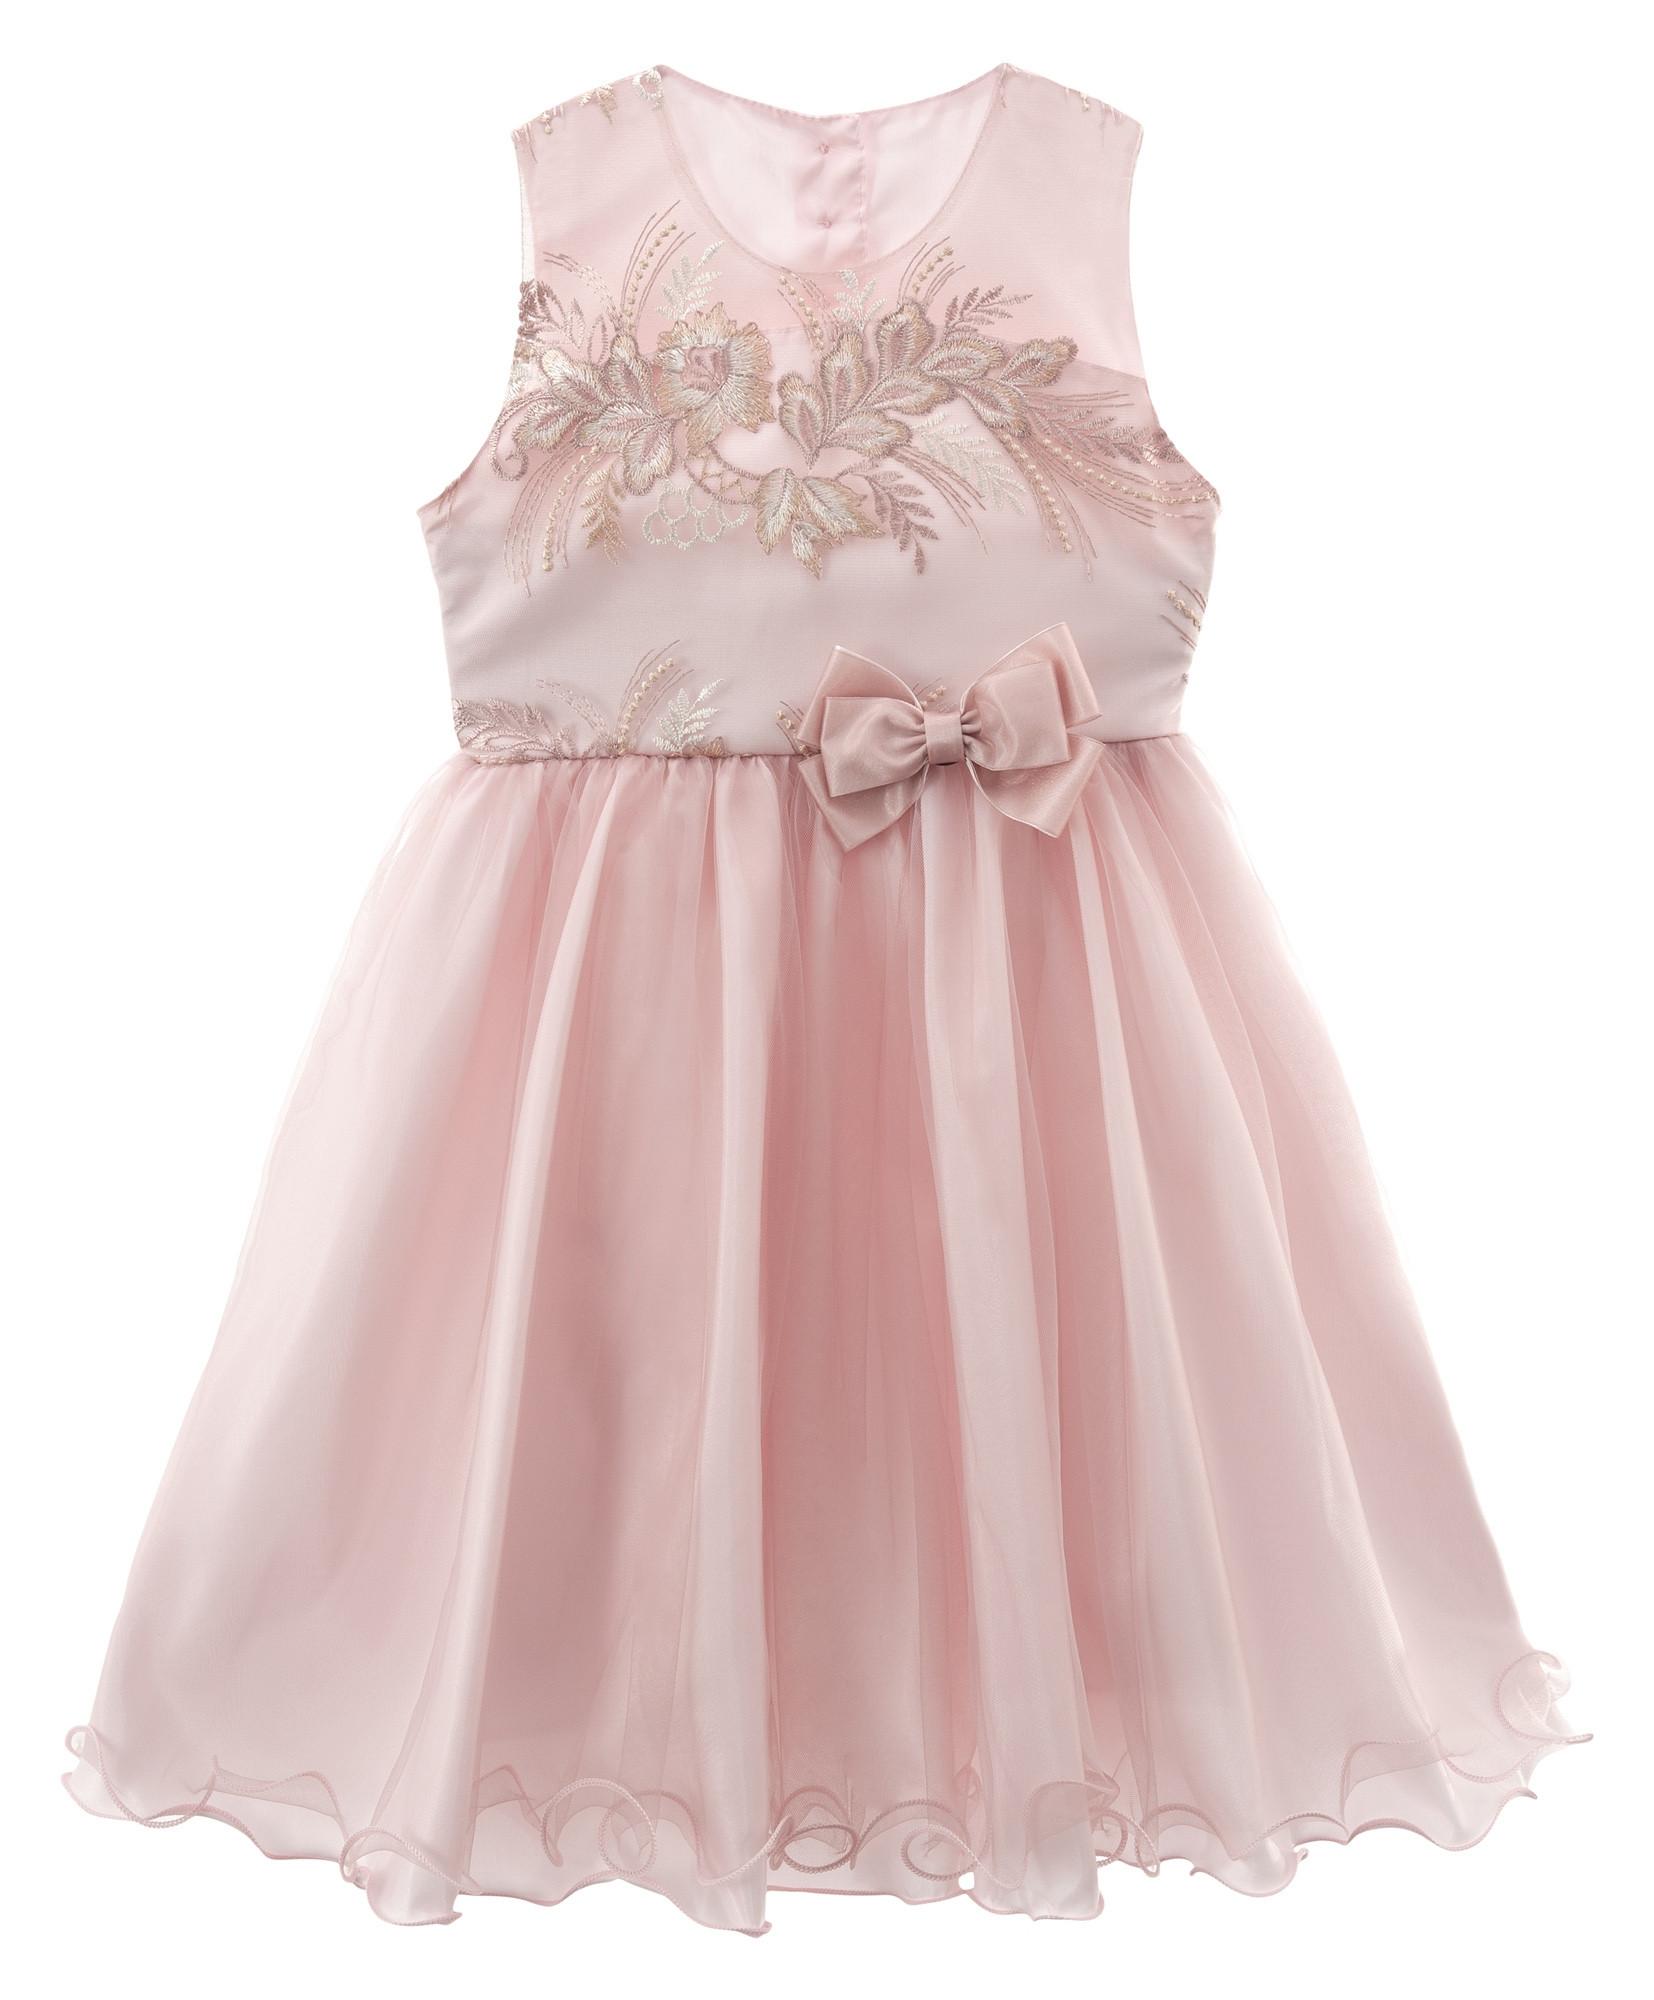 Vestido infantil de festa Libelinha com Tule Bordado Rosa